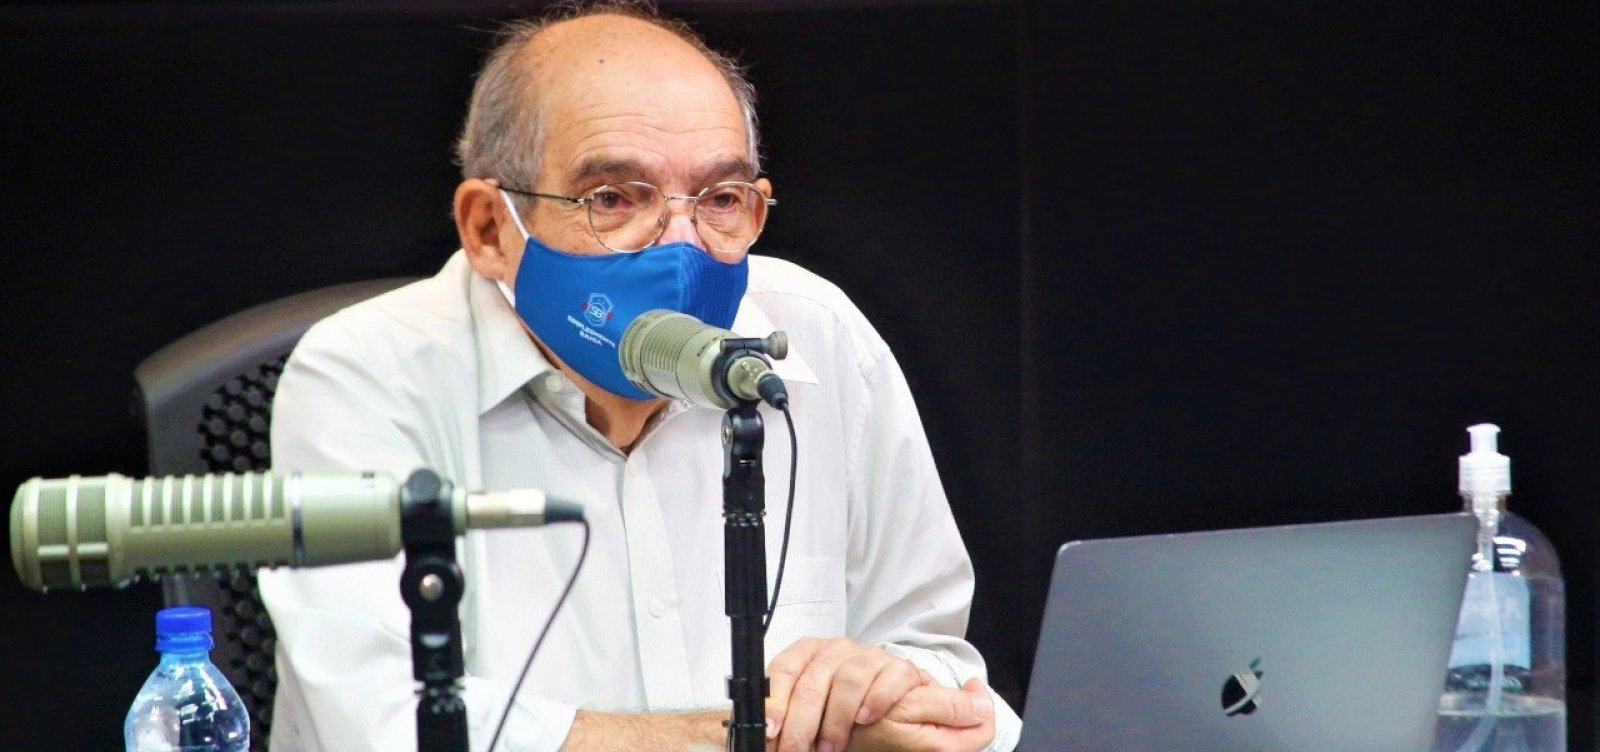 [MK repudia proposta de congelamento de aposentadorias: 'O que Paulo Guedes pensa da vida?']